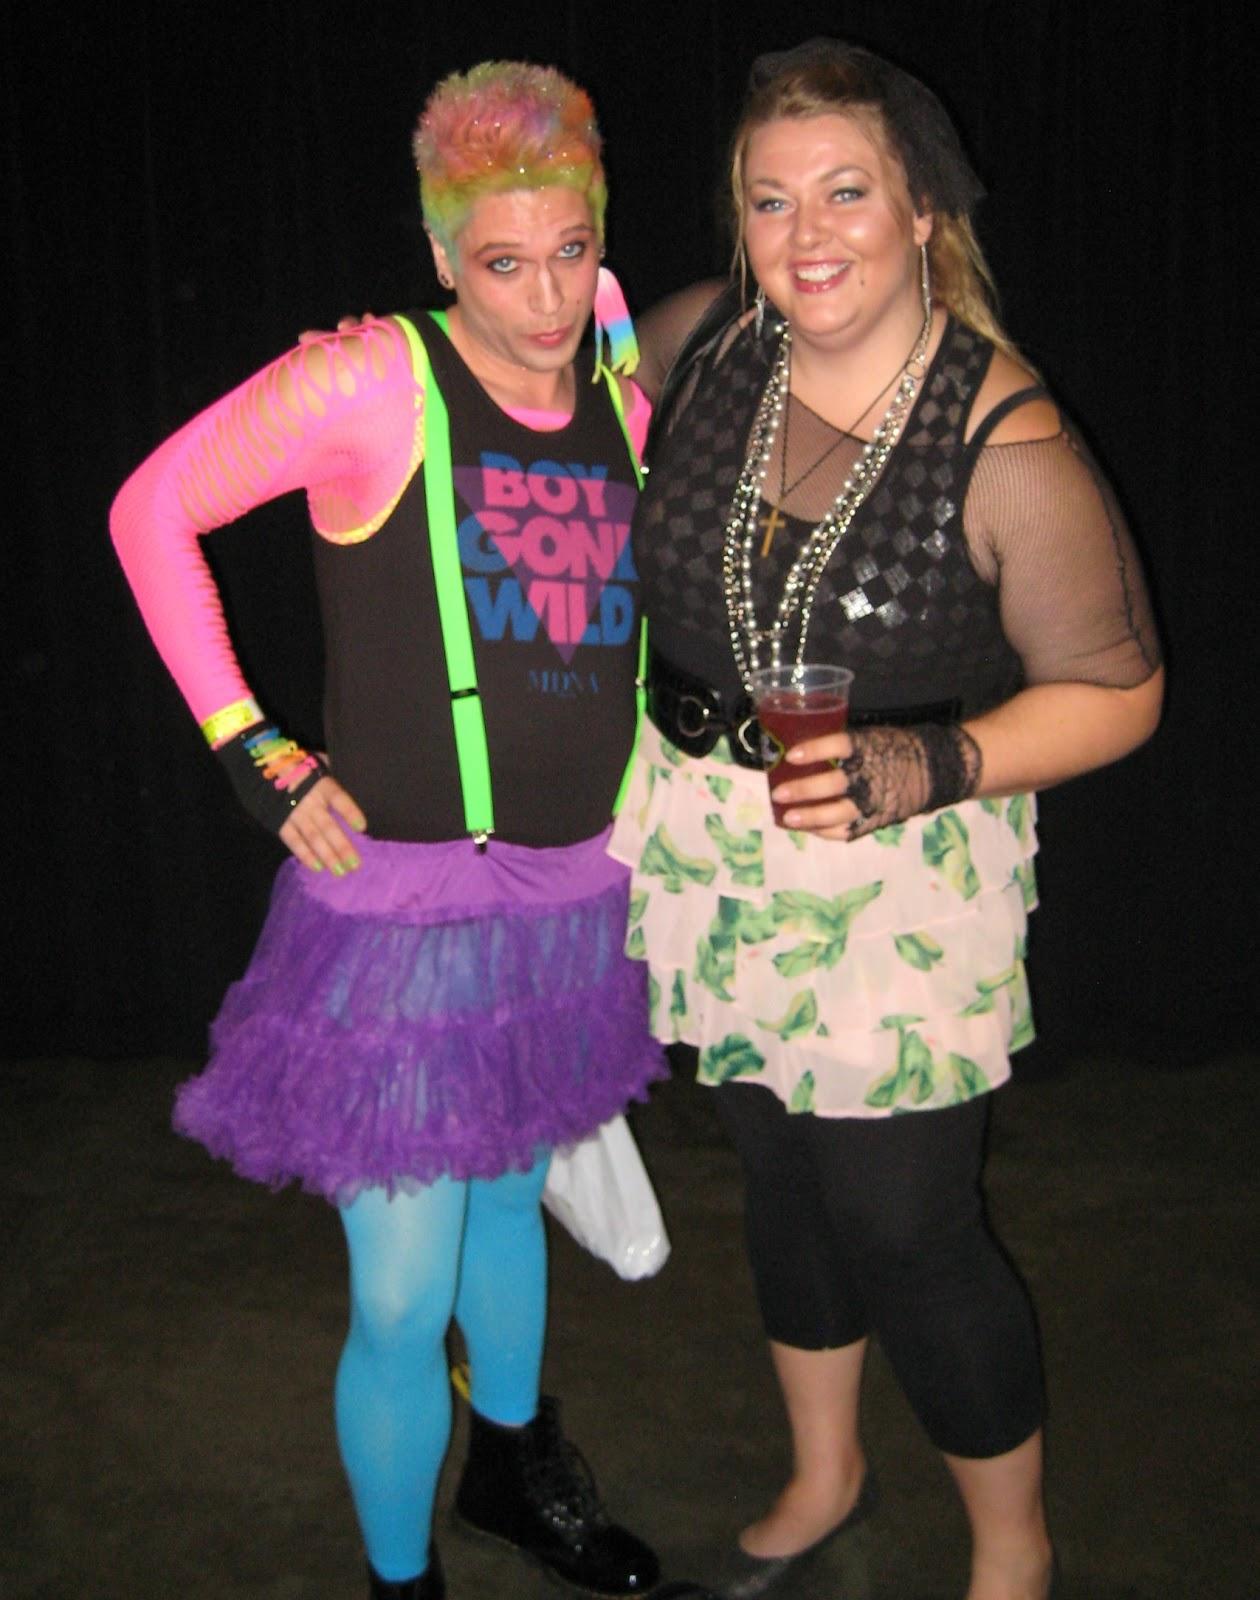 http://3.bp.blogspot.com/-hD4Gt6QWCIs/ULVThXvVehI/AAAAAAAAo6E/sWkV0dyRoO4/s1600/Madonna+concert+fan+outfit+boy+gone+wild+picture.jpg